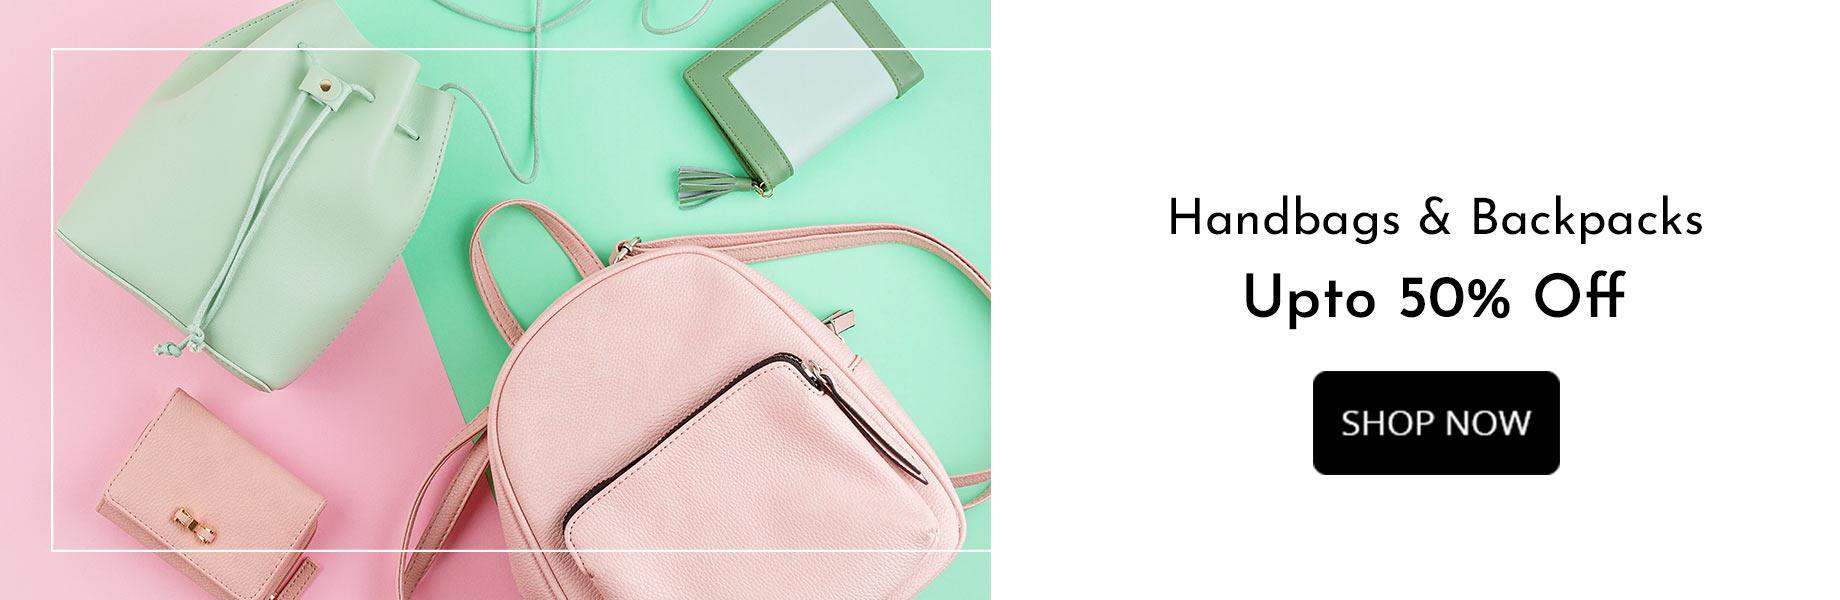 handbagBag_web.jpg